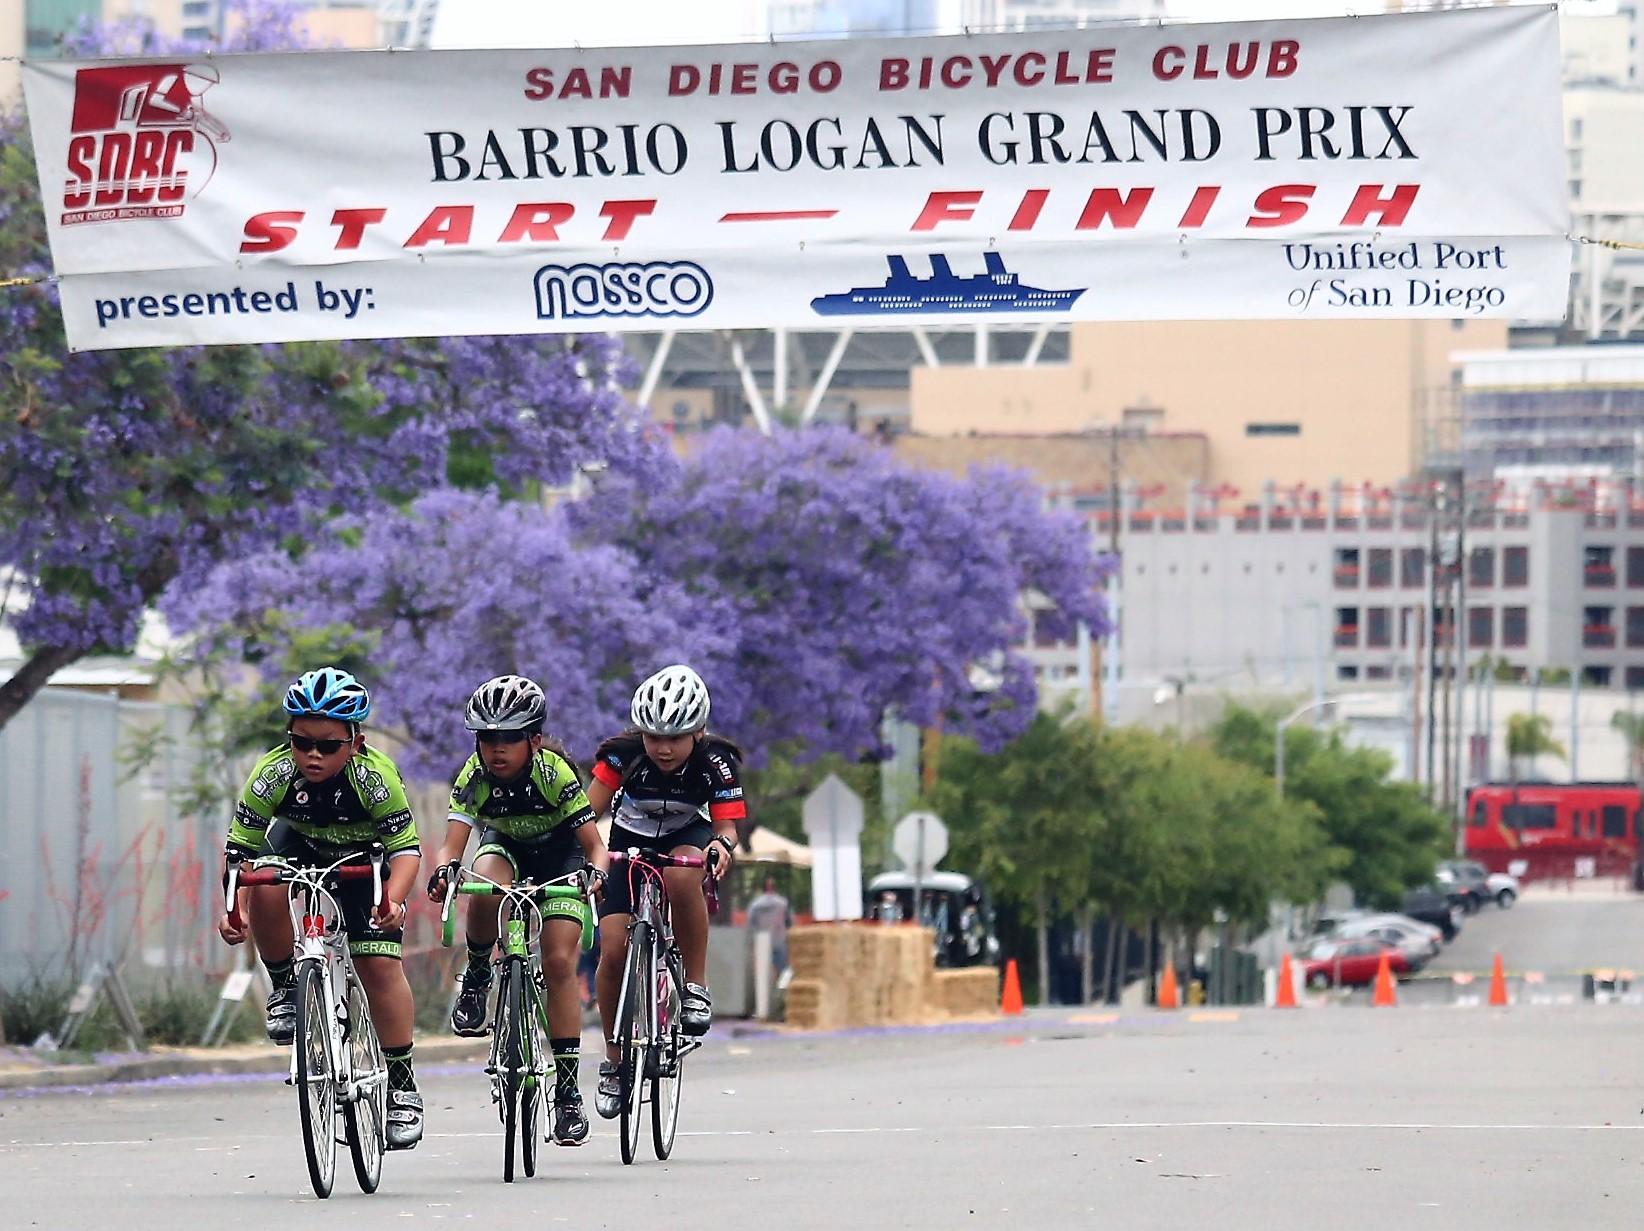 2017 Barrio Logan Grand Prix